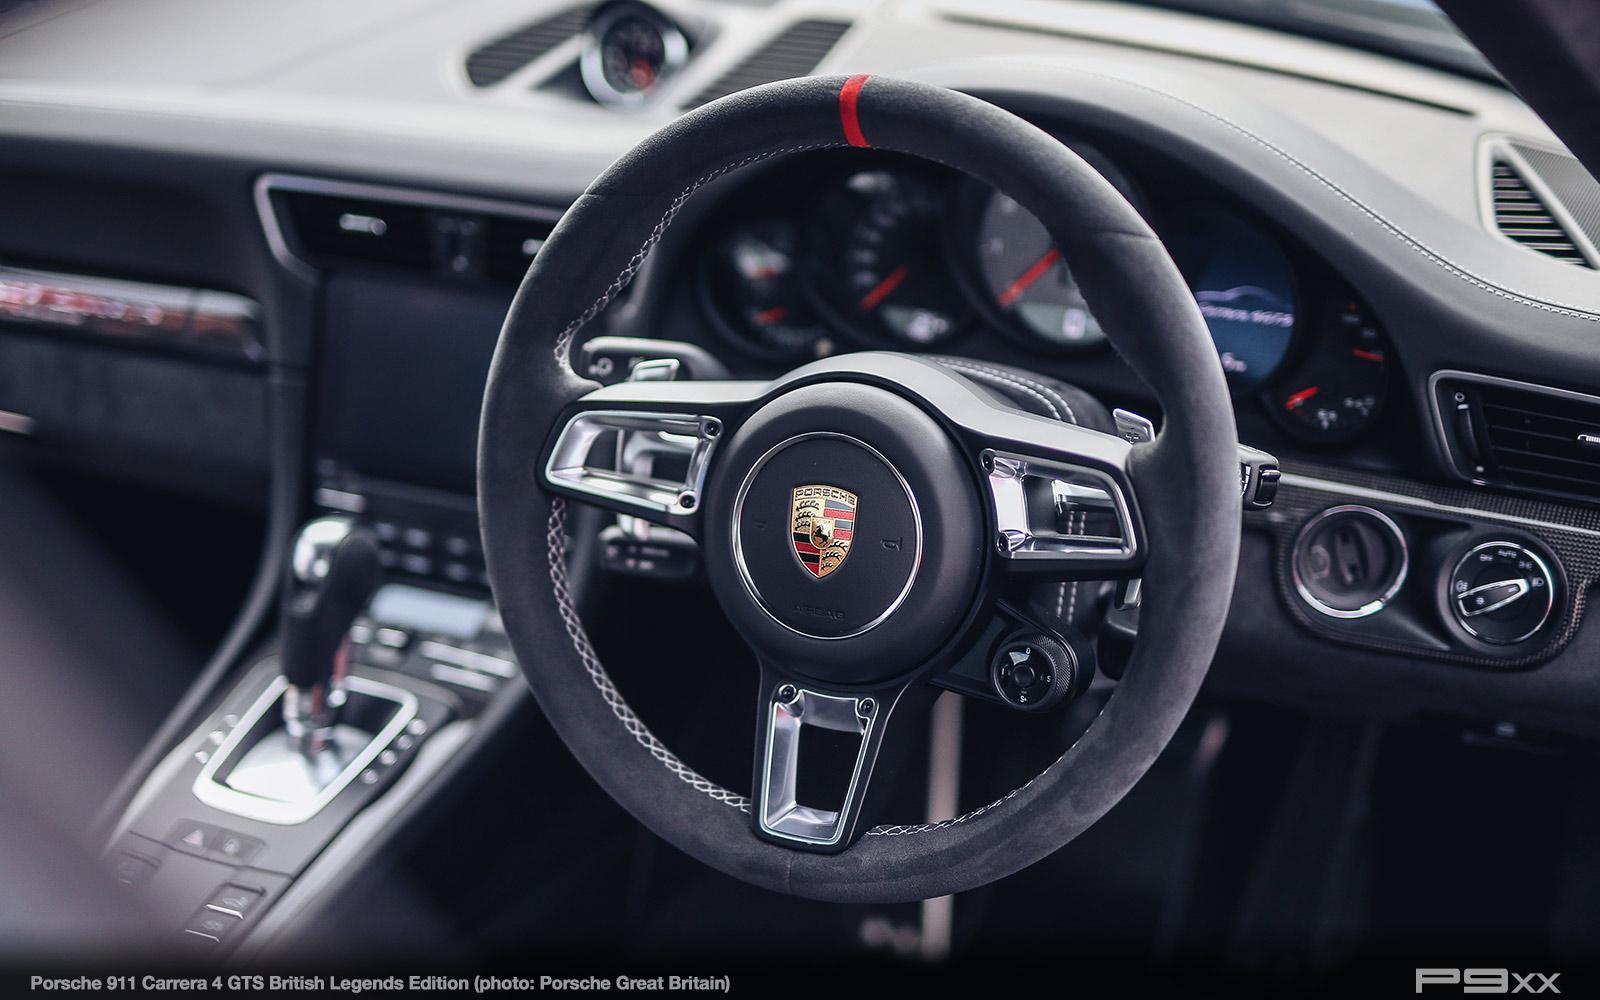 Porsche-911-Carrera-4-GTS-British-Legends-Edition-377